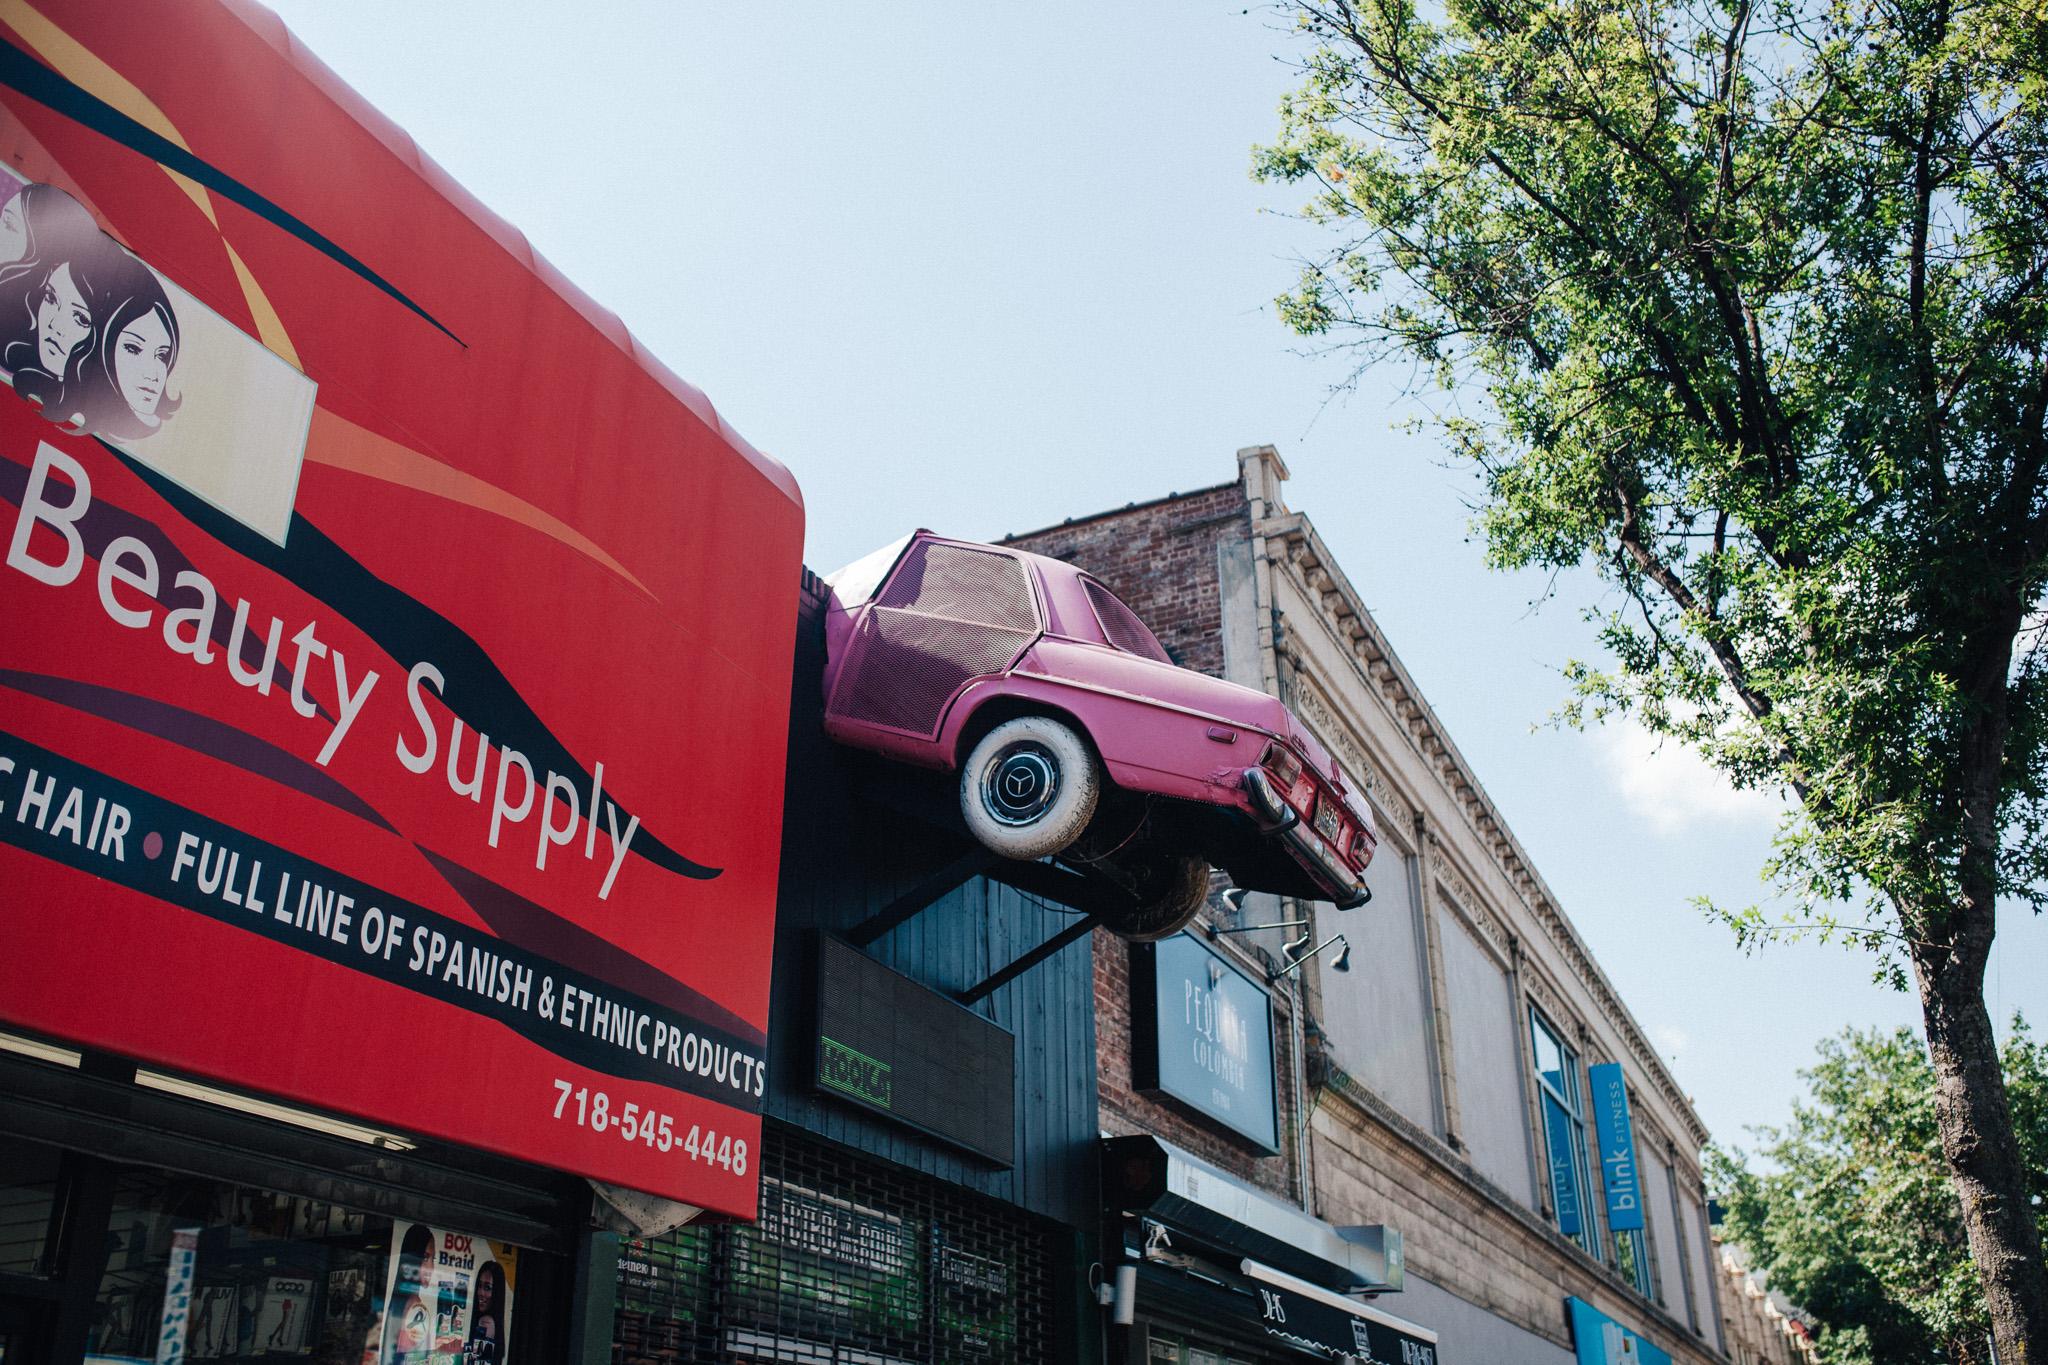 Astoria, Queens - Shadi Garman Photography